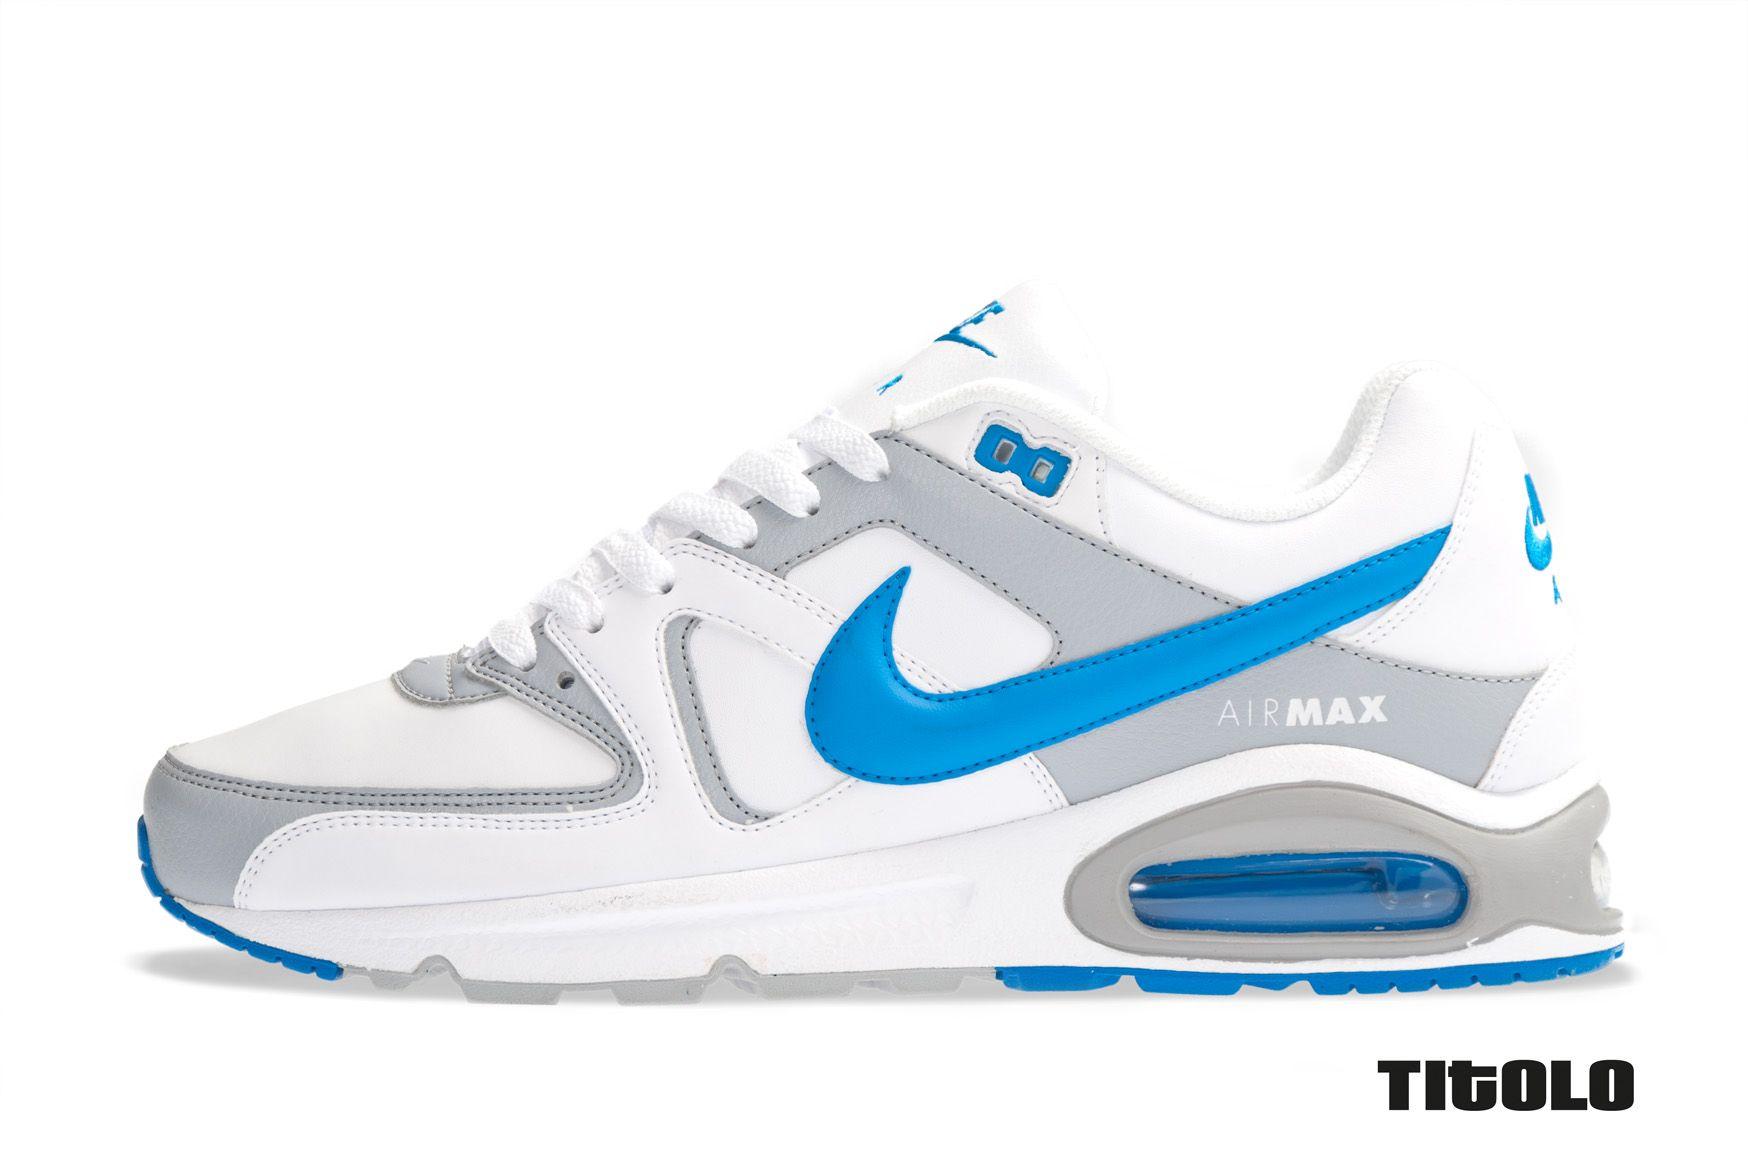 Nike Air Max Max Command Militares Nike Air Max Max Command Y Air Max cfda3d